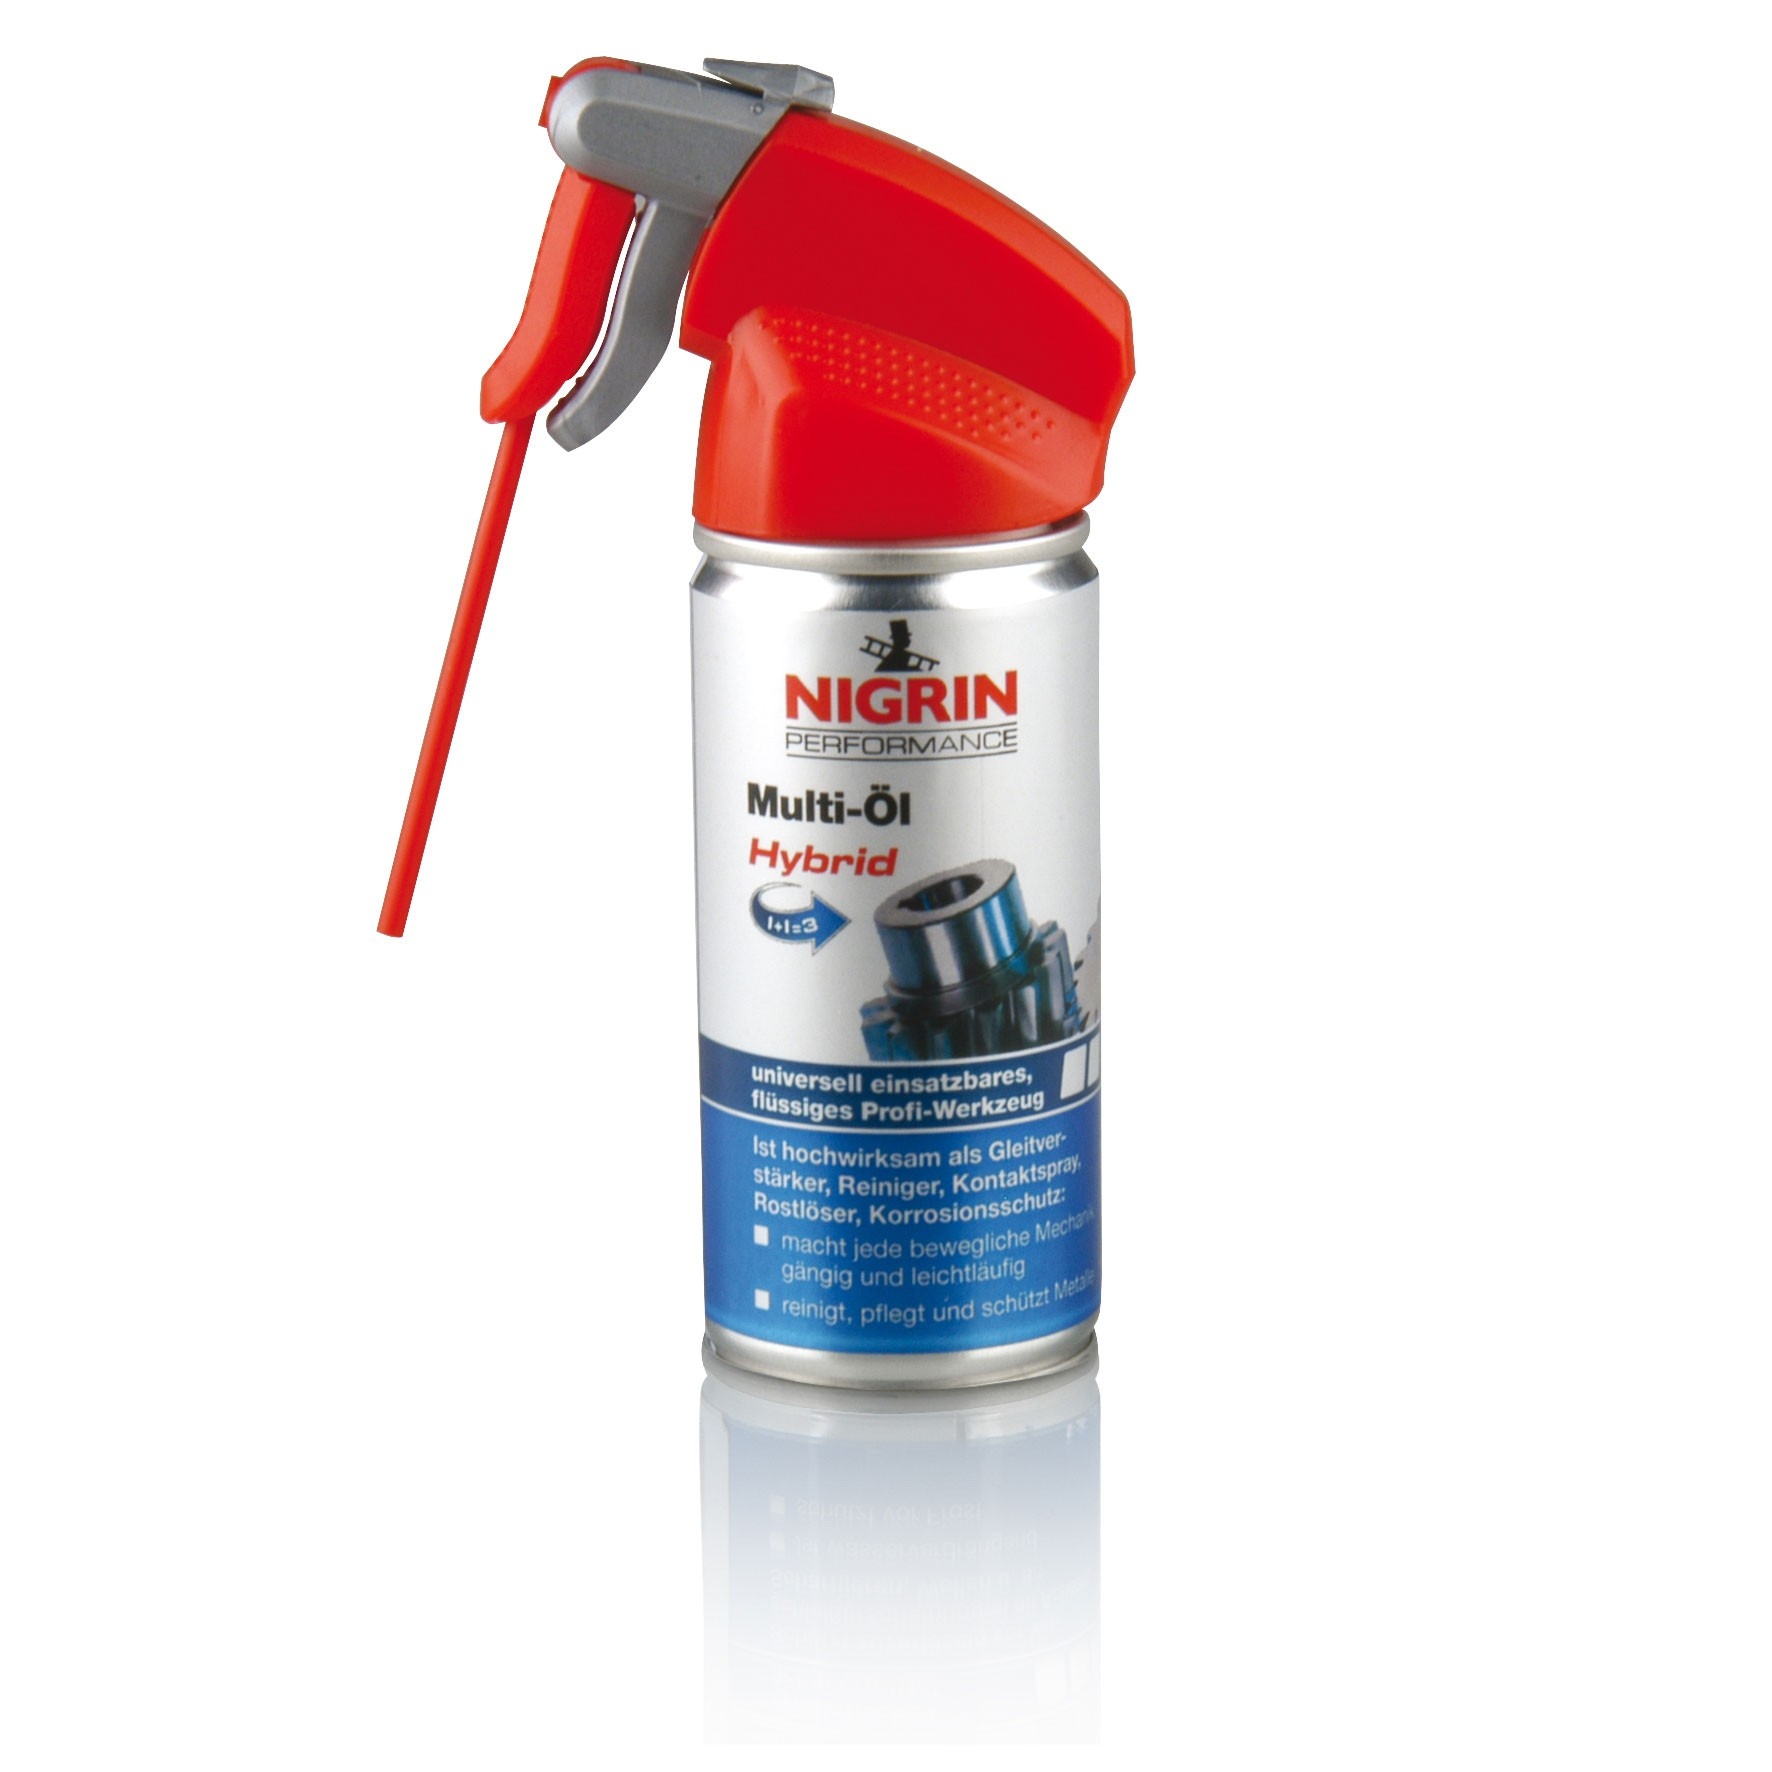 Nigrin Performance Universal Ölspray / Multi-Öl Hybrid 100ml Bild 1